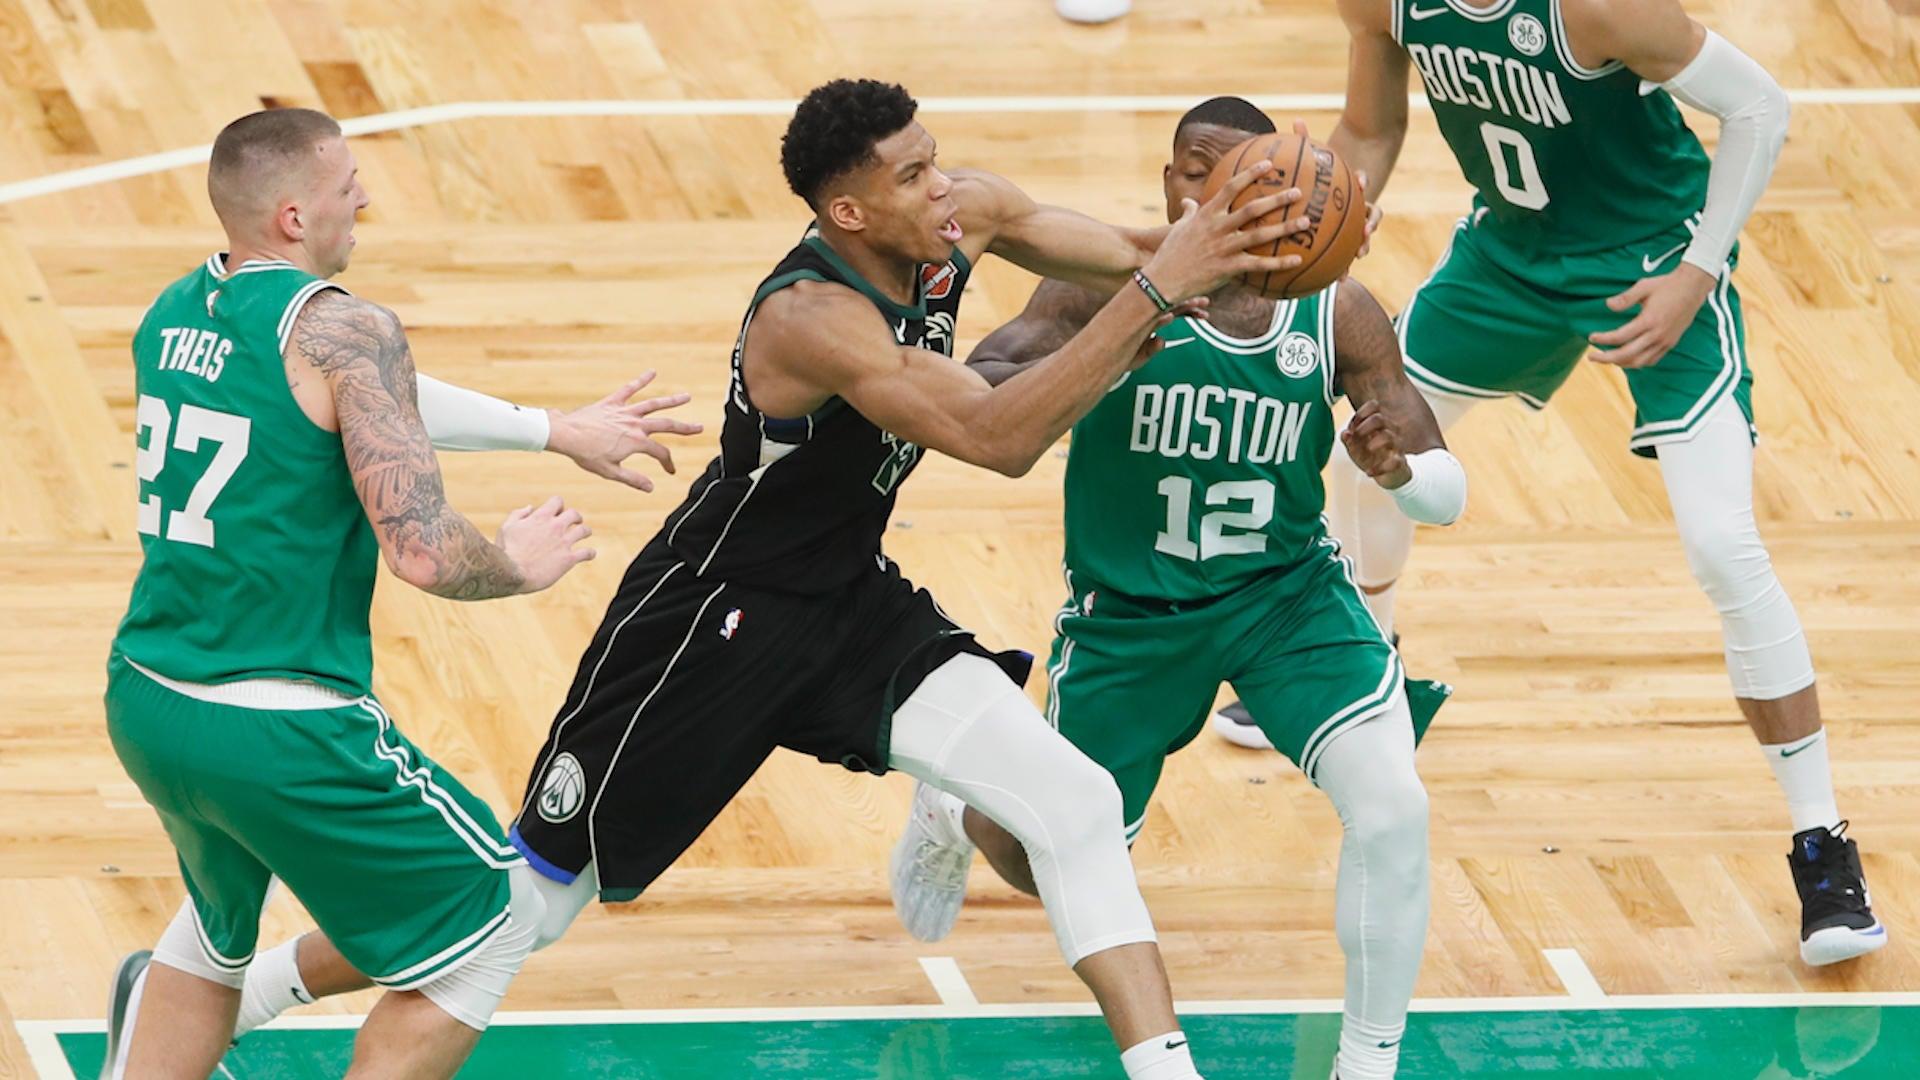 Celtics vs. Bucks odds, line: NBA picks, top predictions from model on 44-30 run